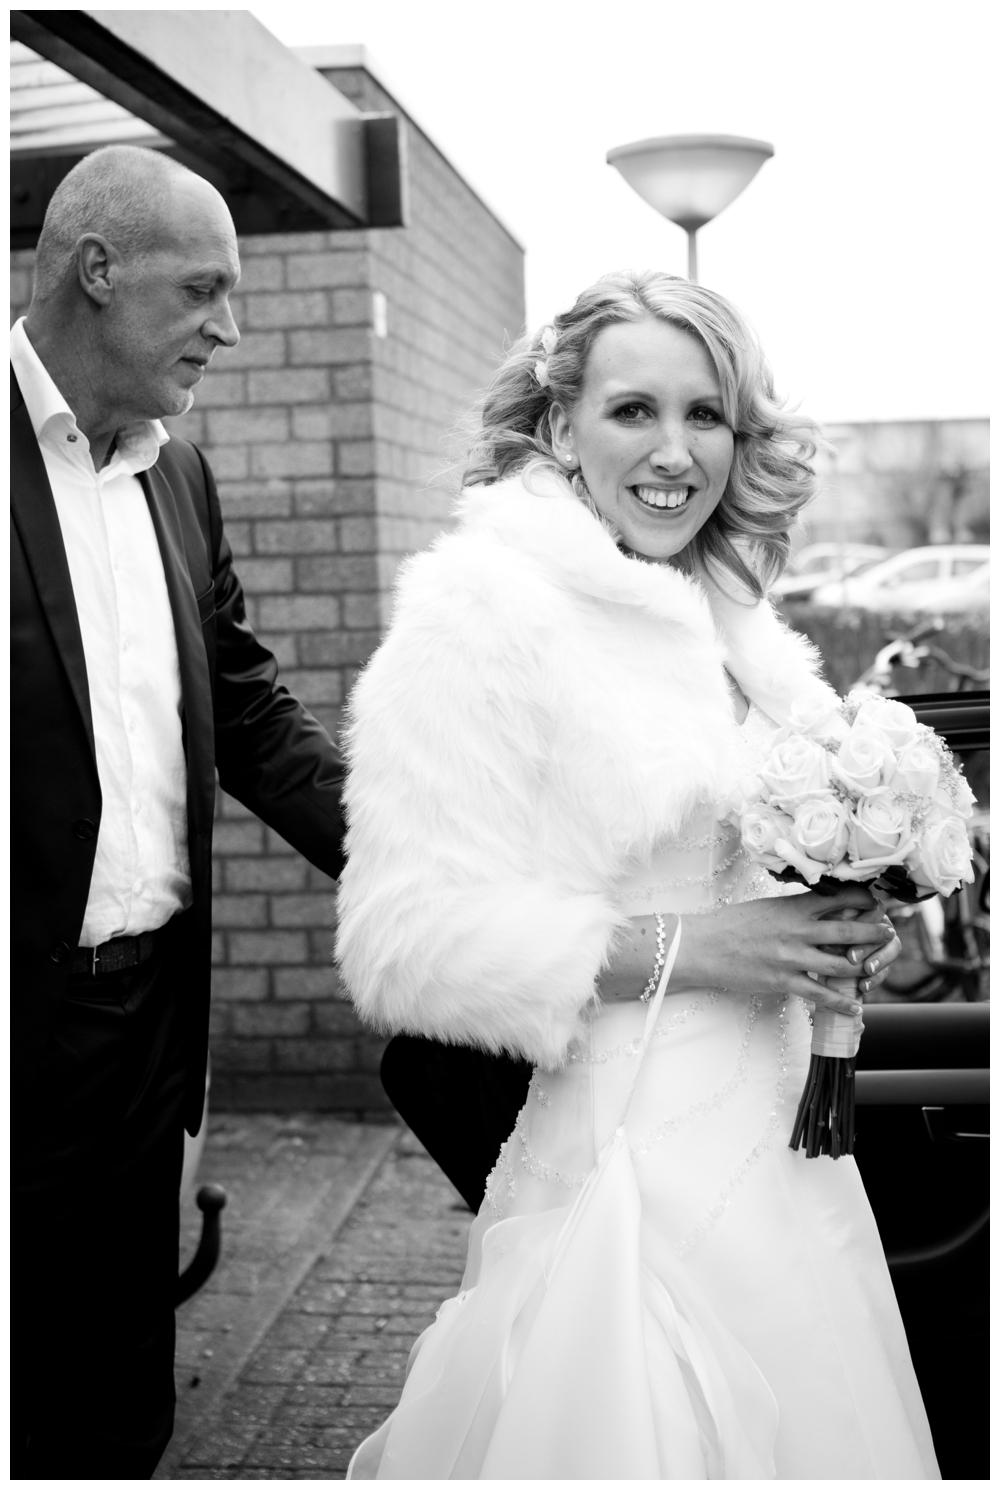 Wedding Robbert&Marlon ZW042.jpg